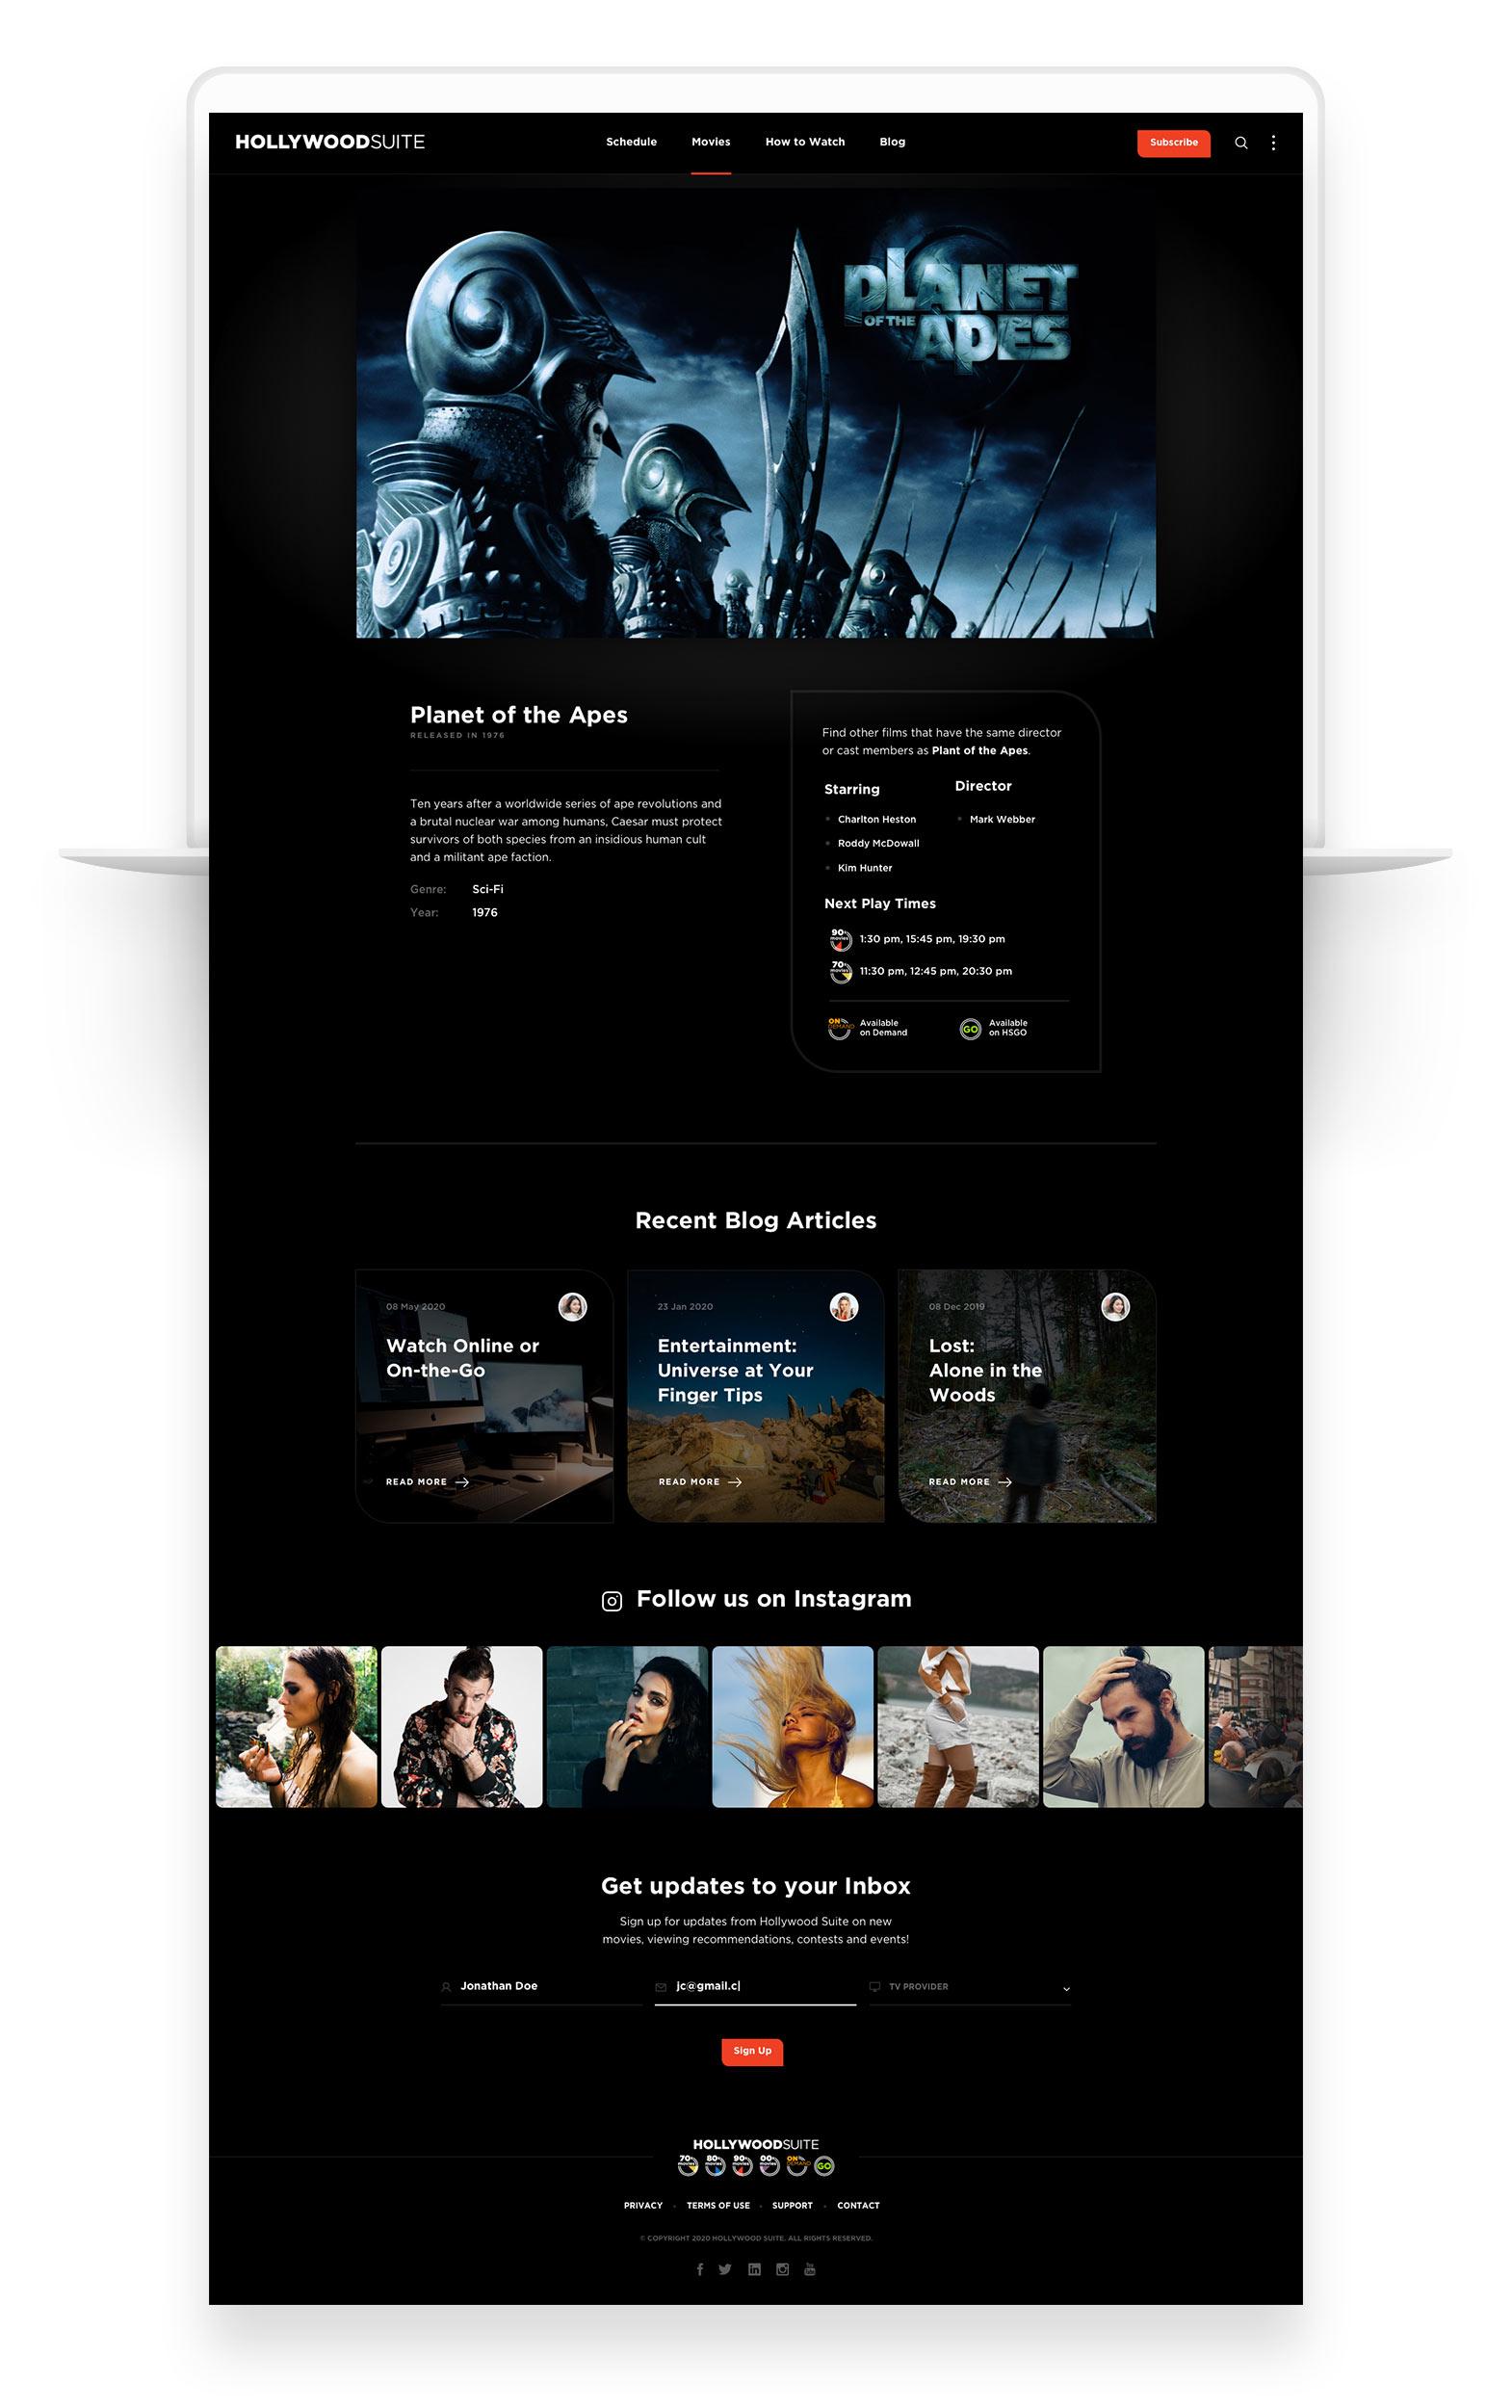 Custom Web Design for Hollywood Suite